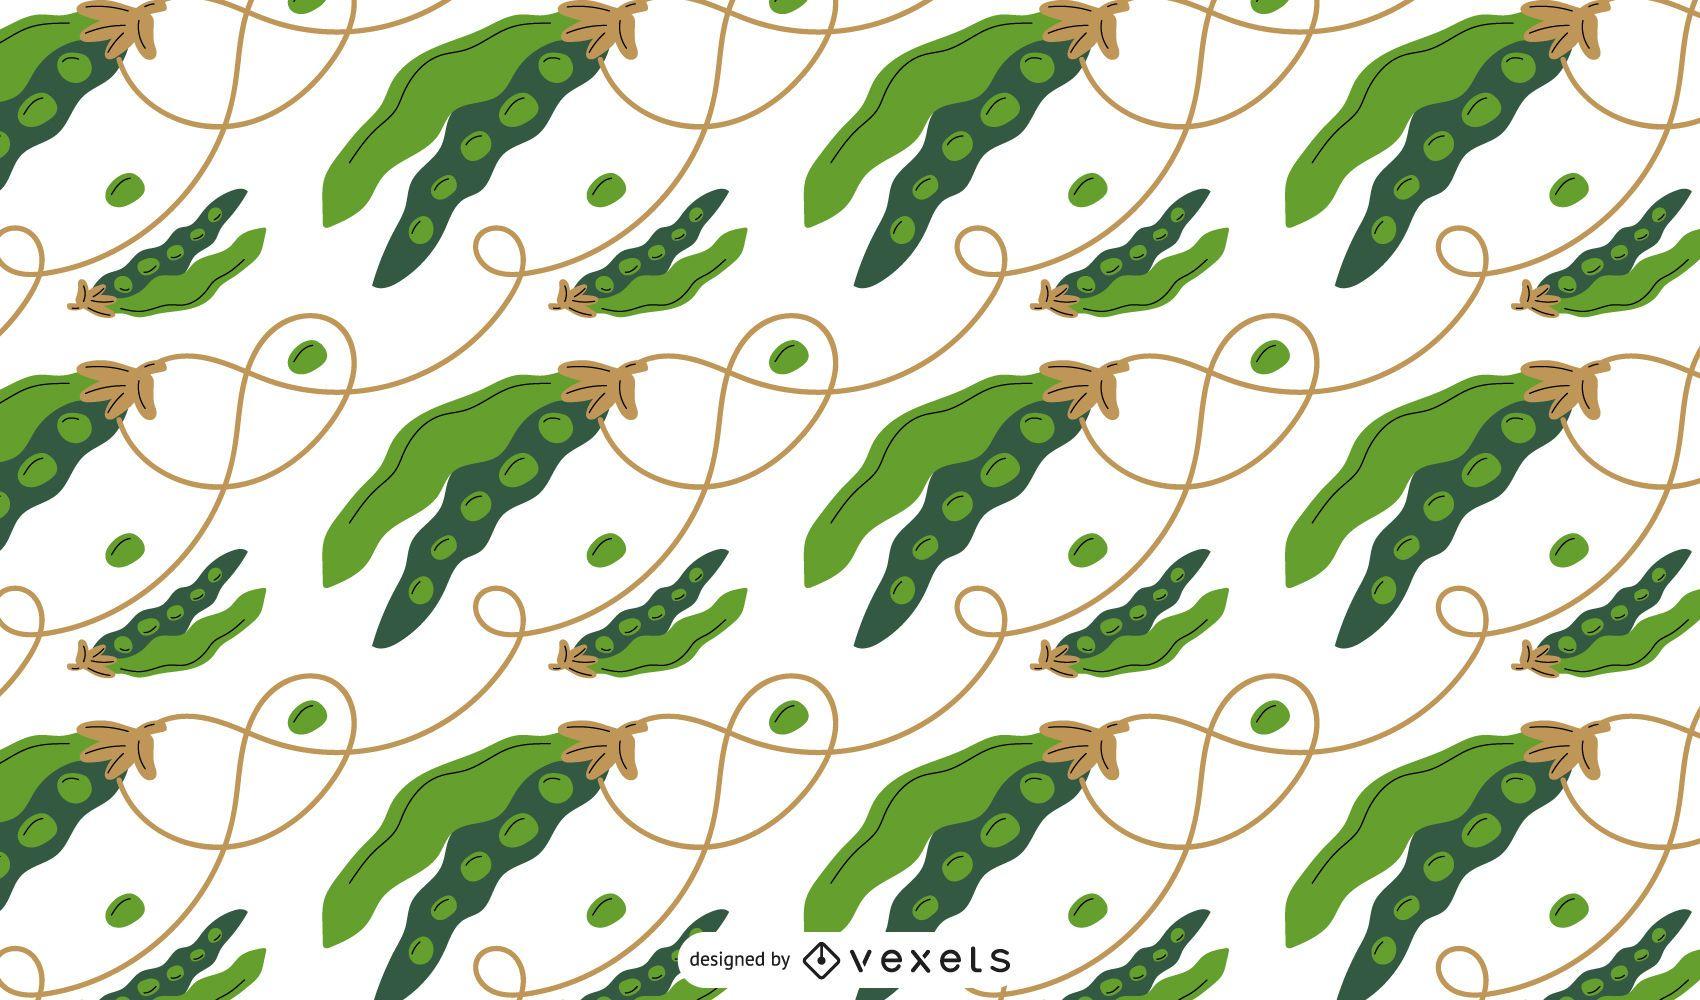 Peas pattern design